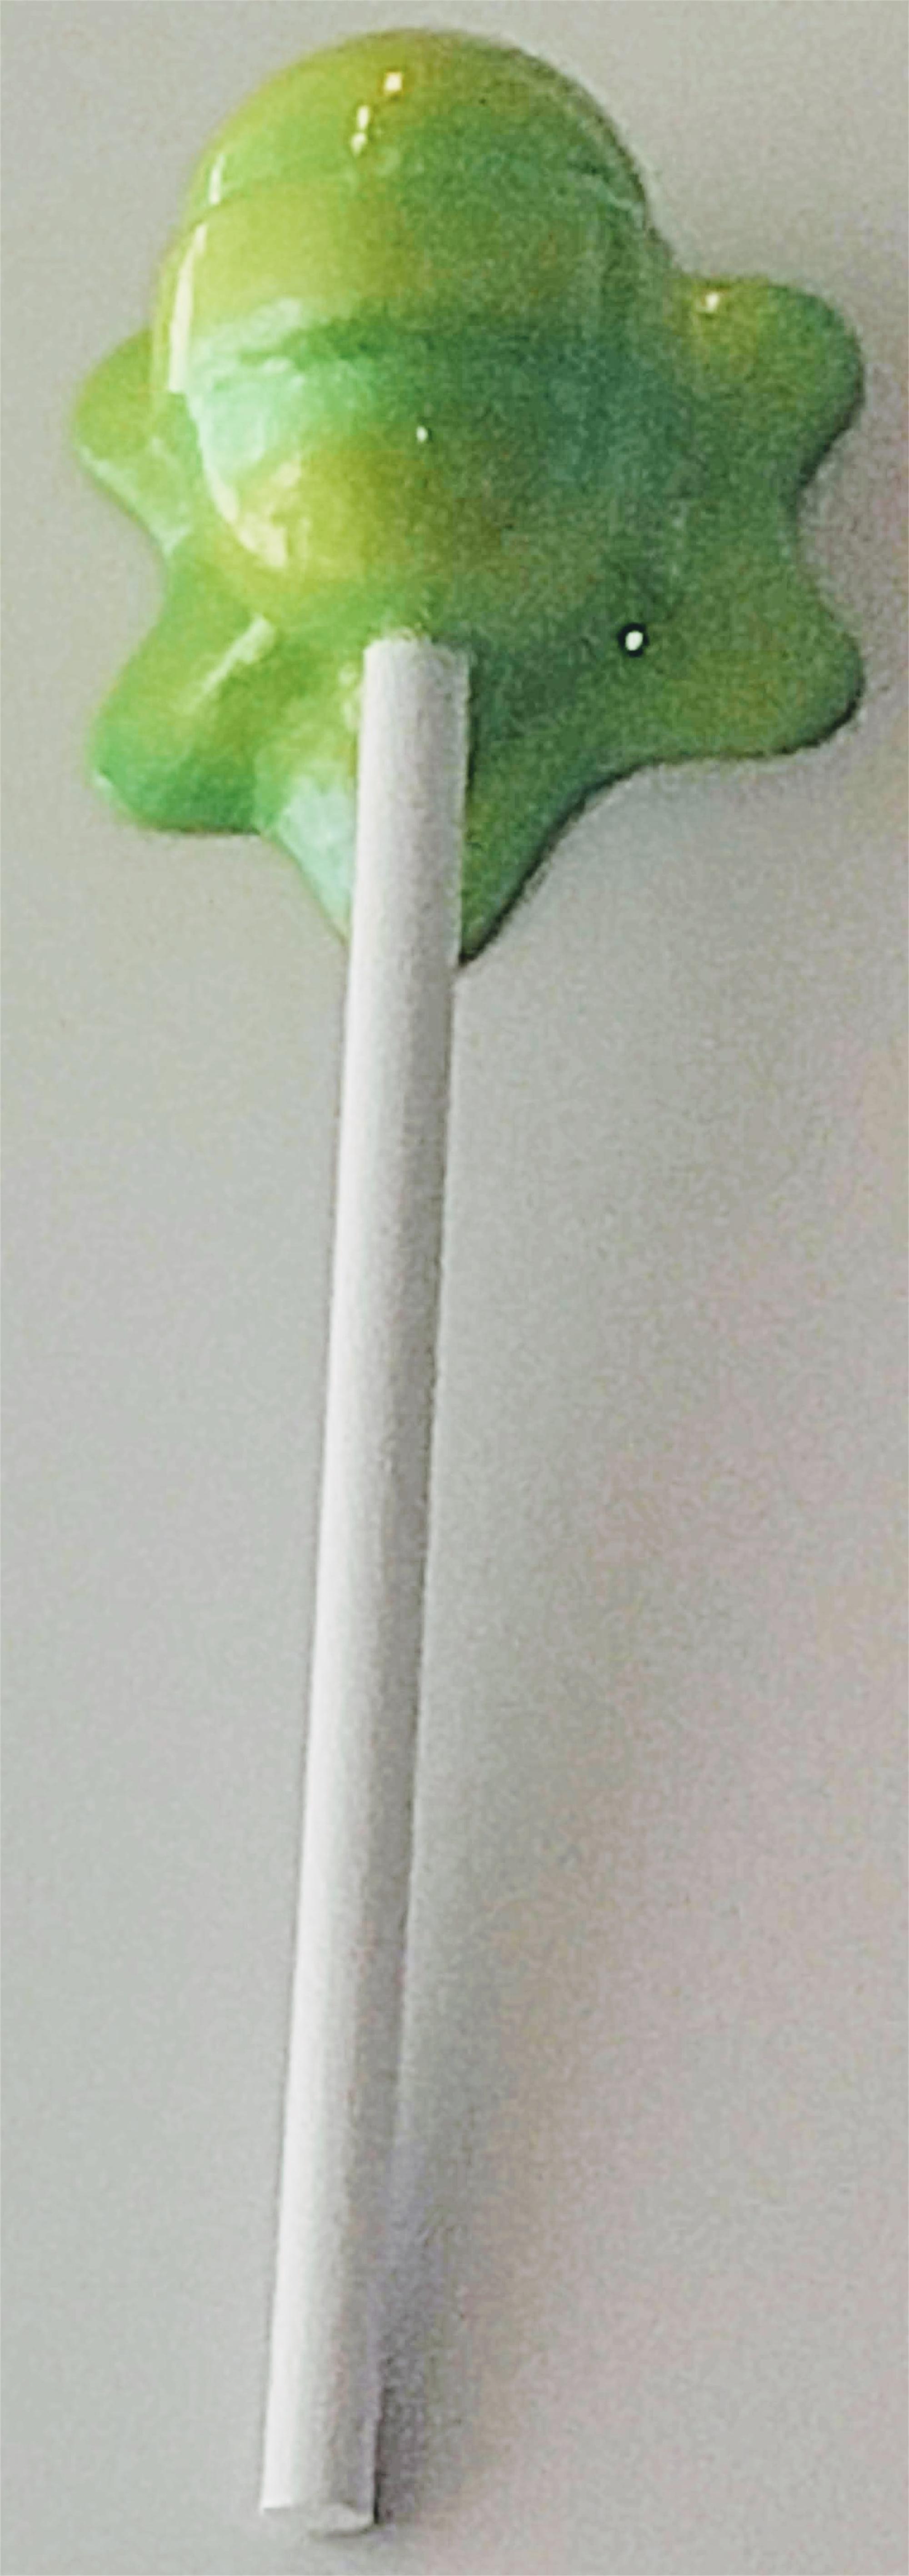 """The Sweet Life"" lime Green Horizontal Lollipop by Elena Bulatova"